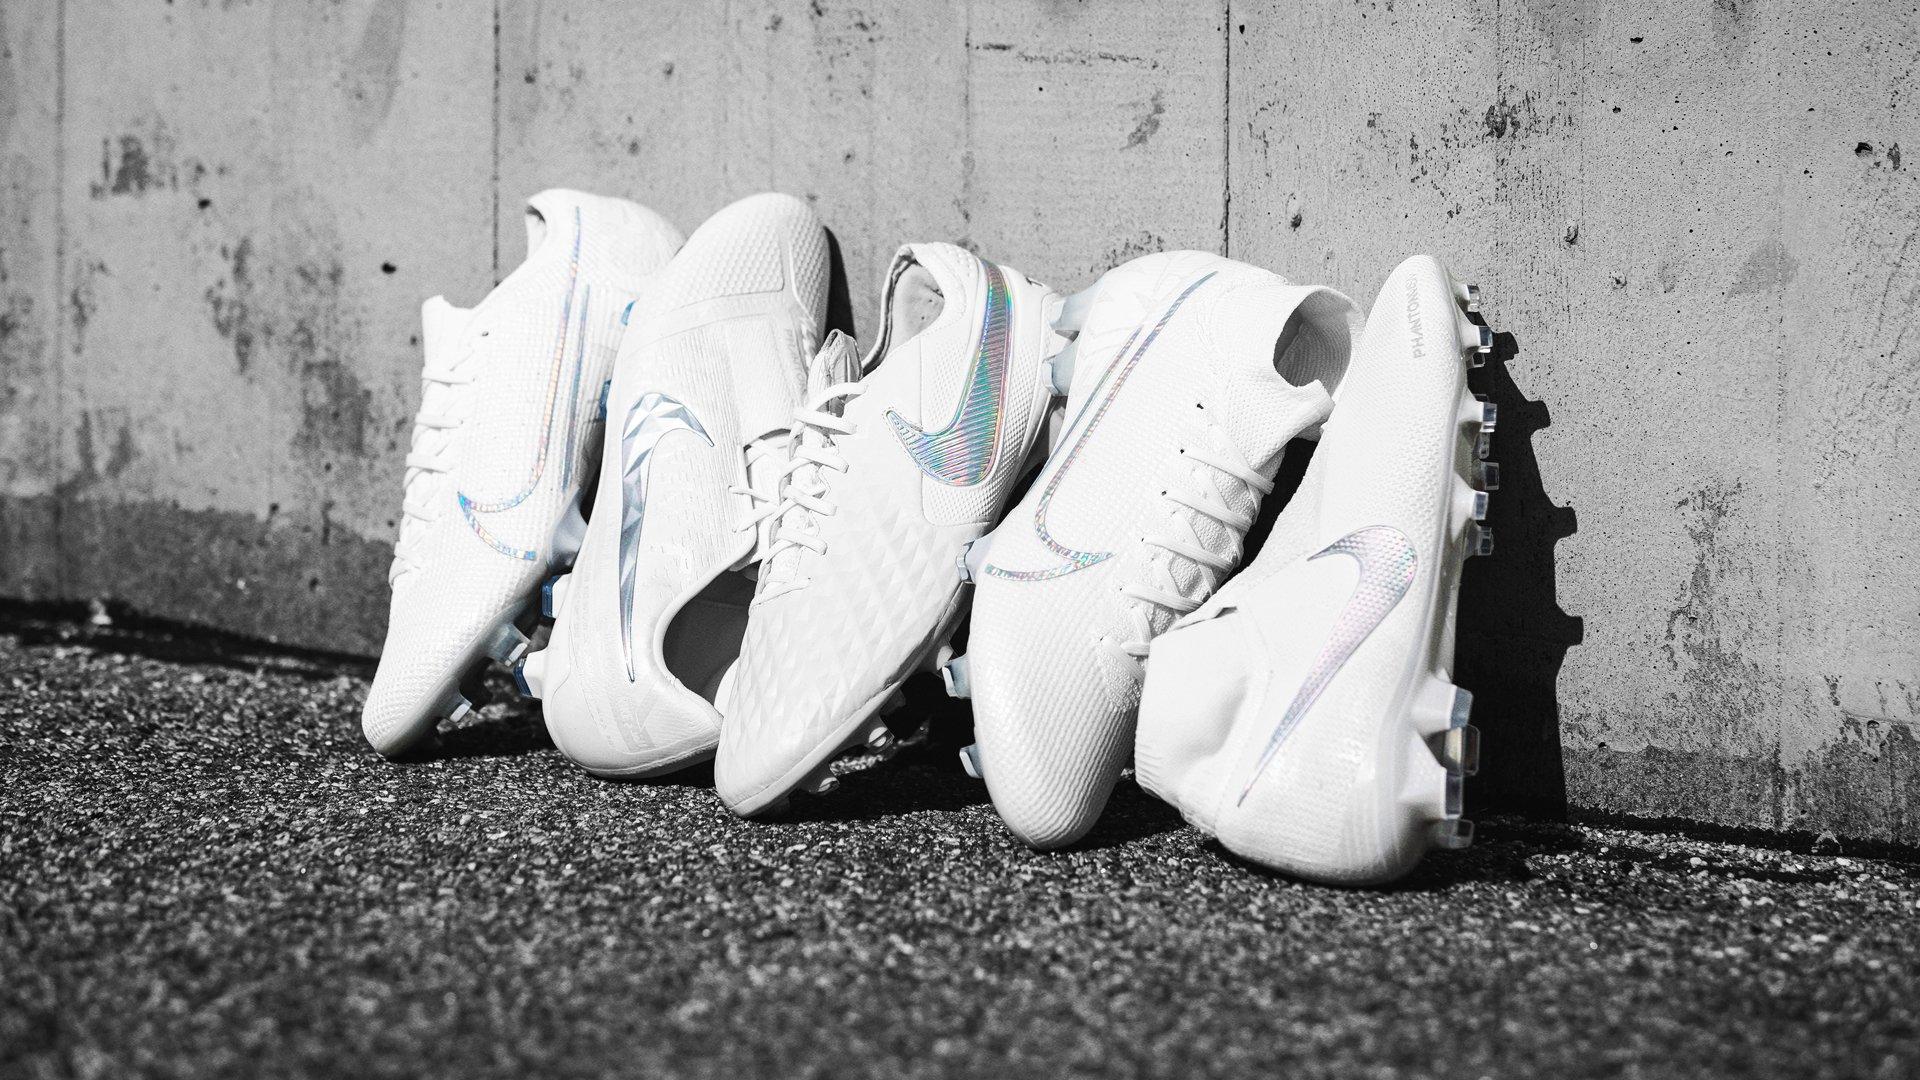 Nike Nuovo White Pack Part II | Krijg alle details bij